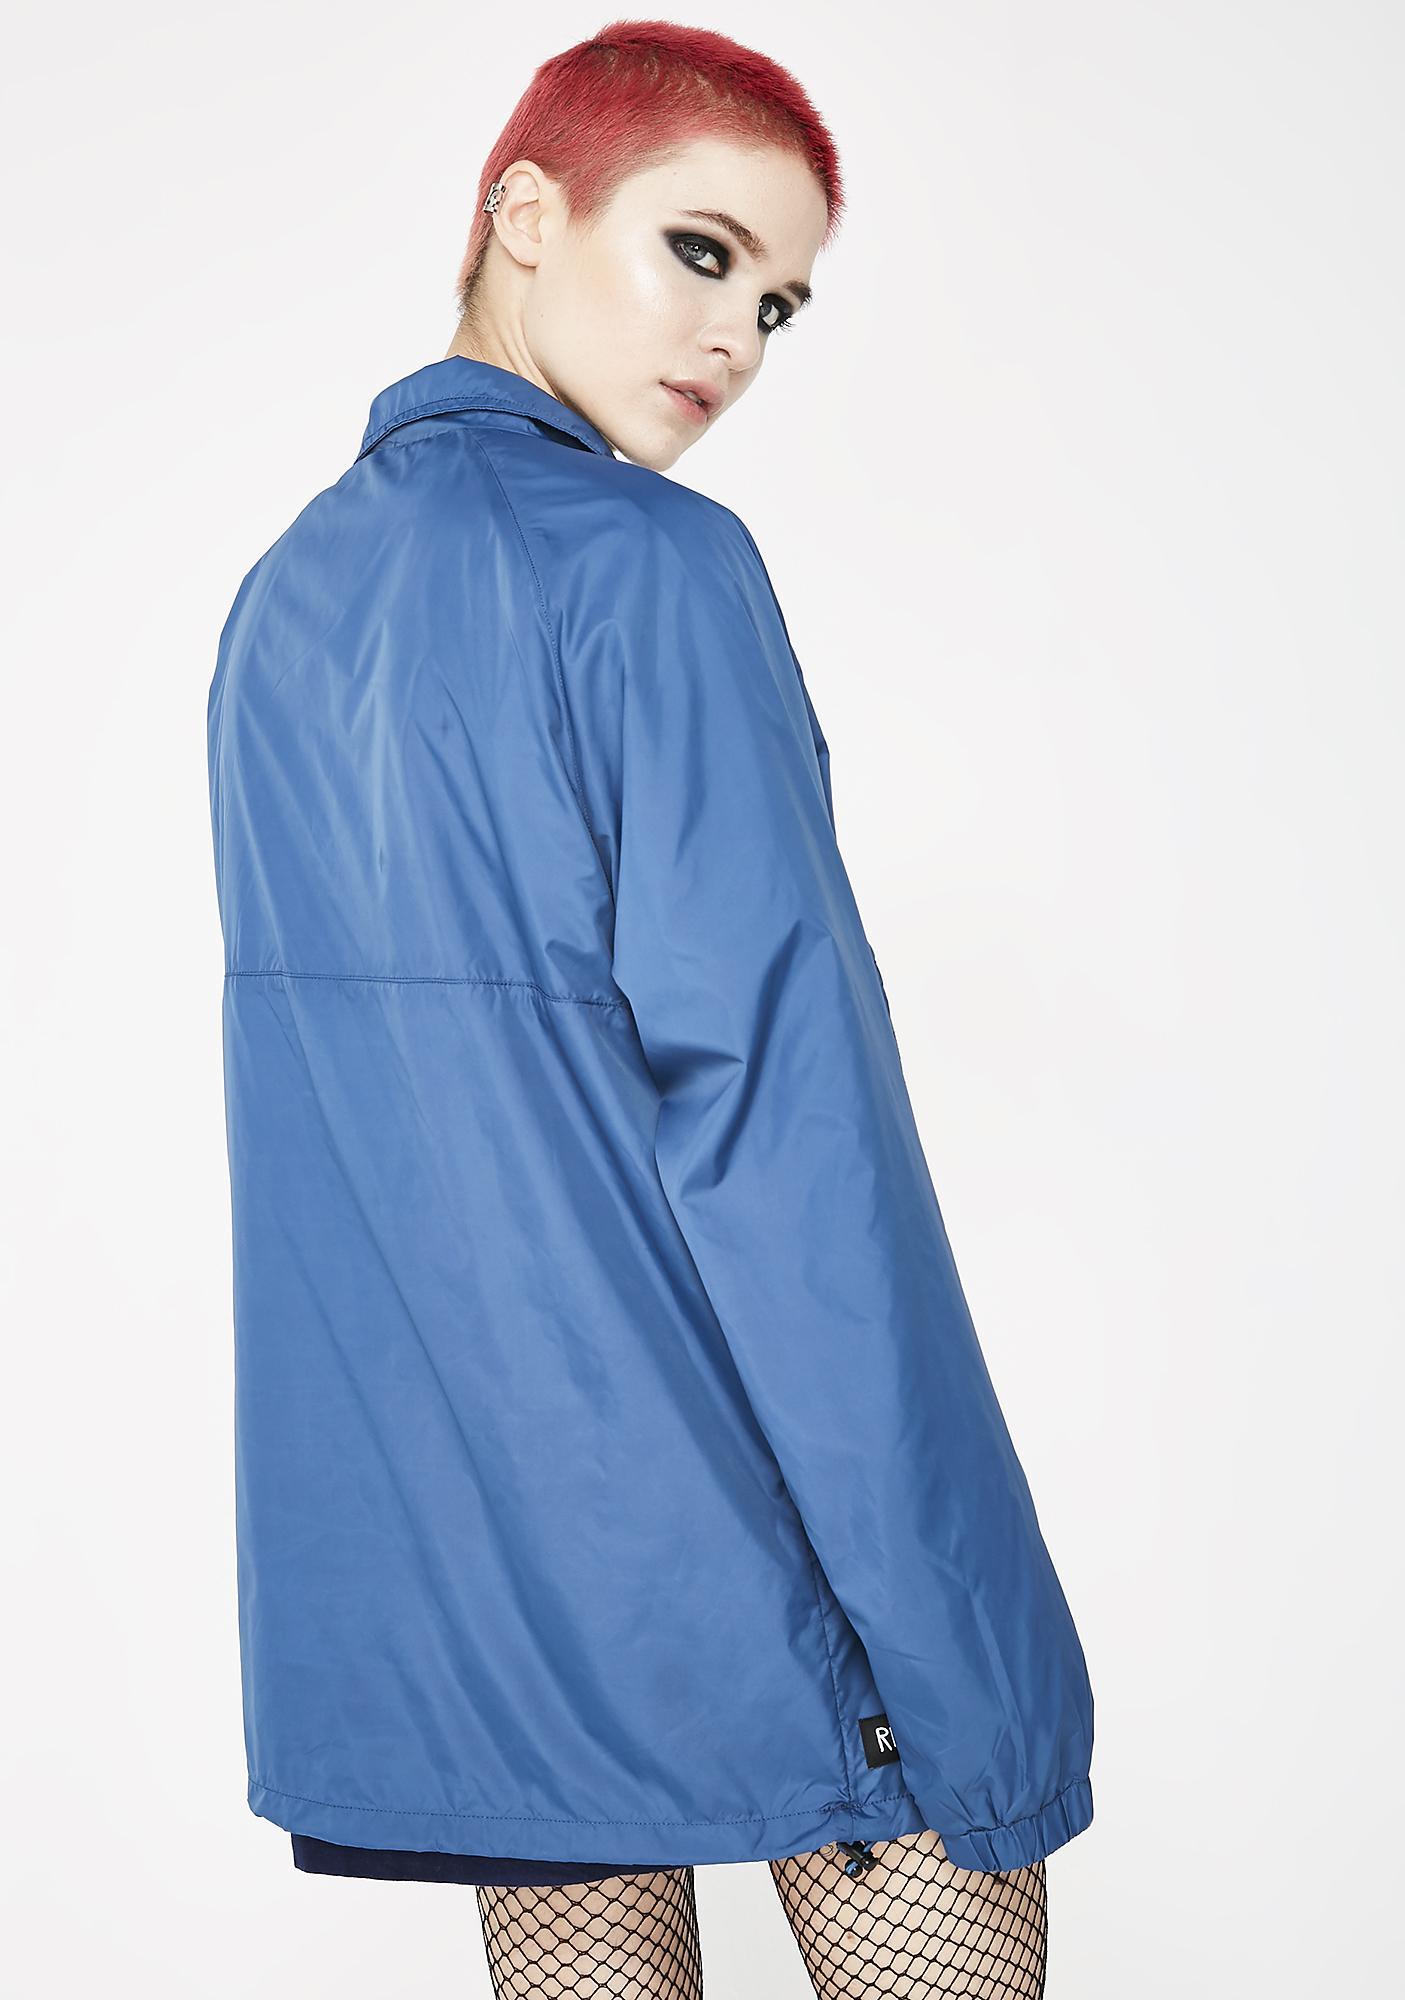 RIPNDIP Must Be Nice Half Zip Anorak Jacket